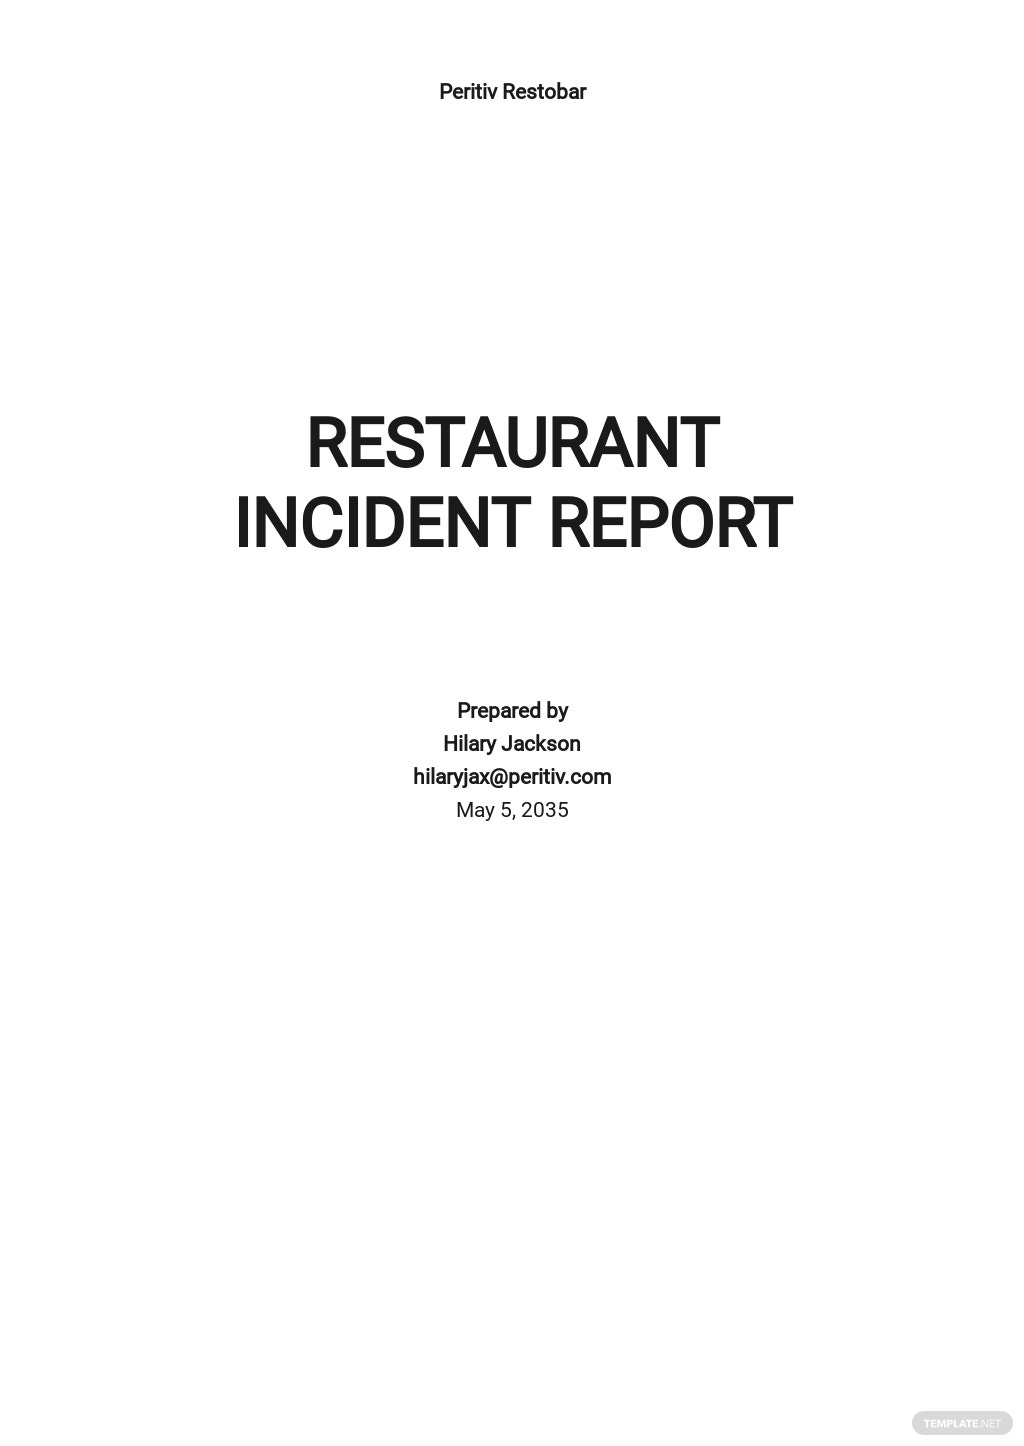 Restaurant Incident Report Template.jpe